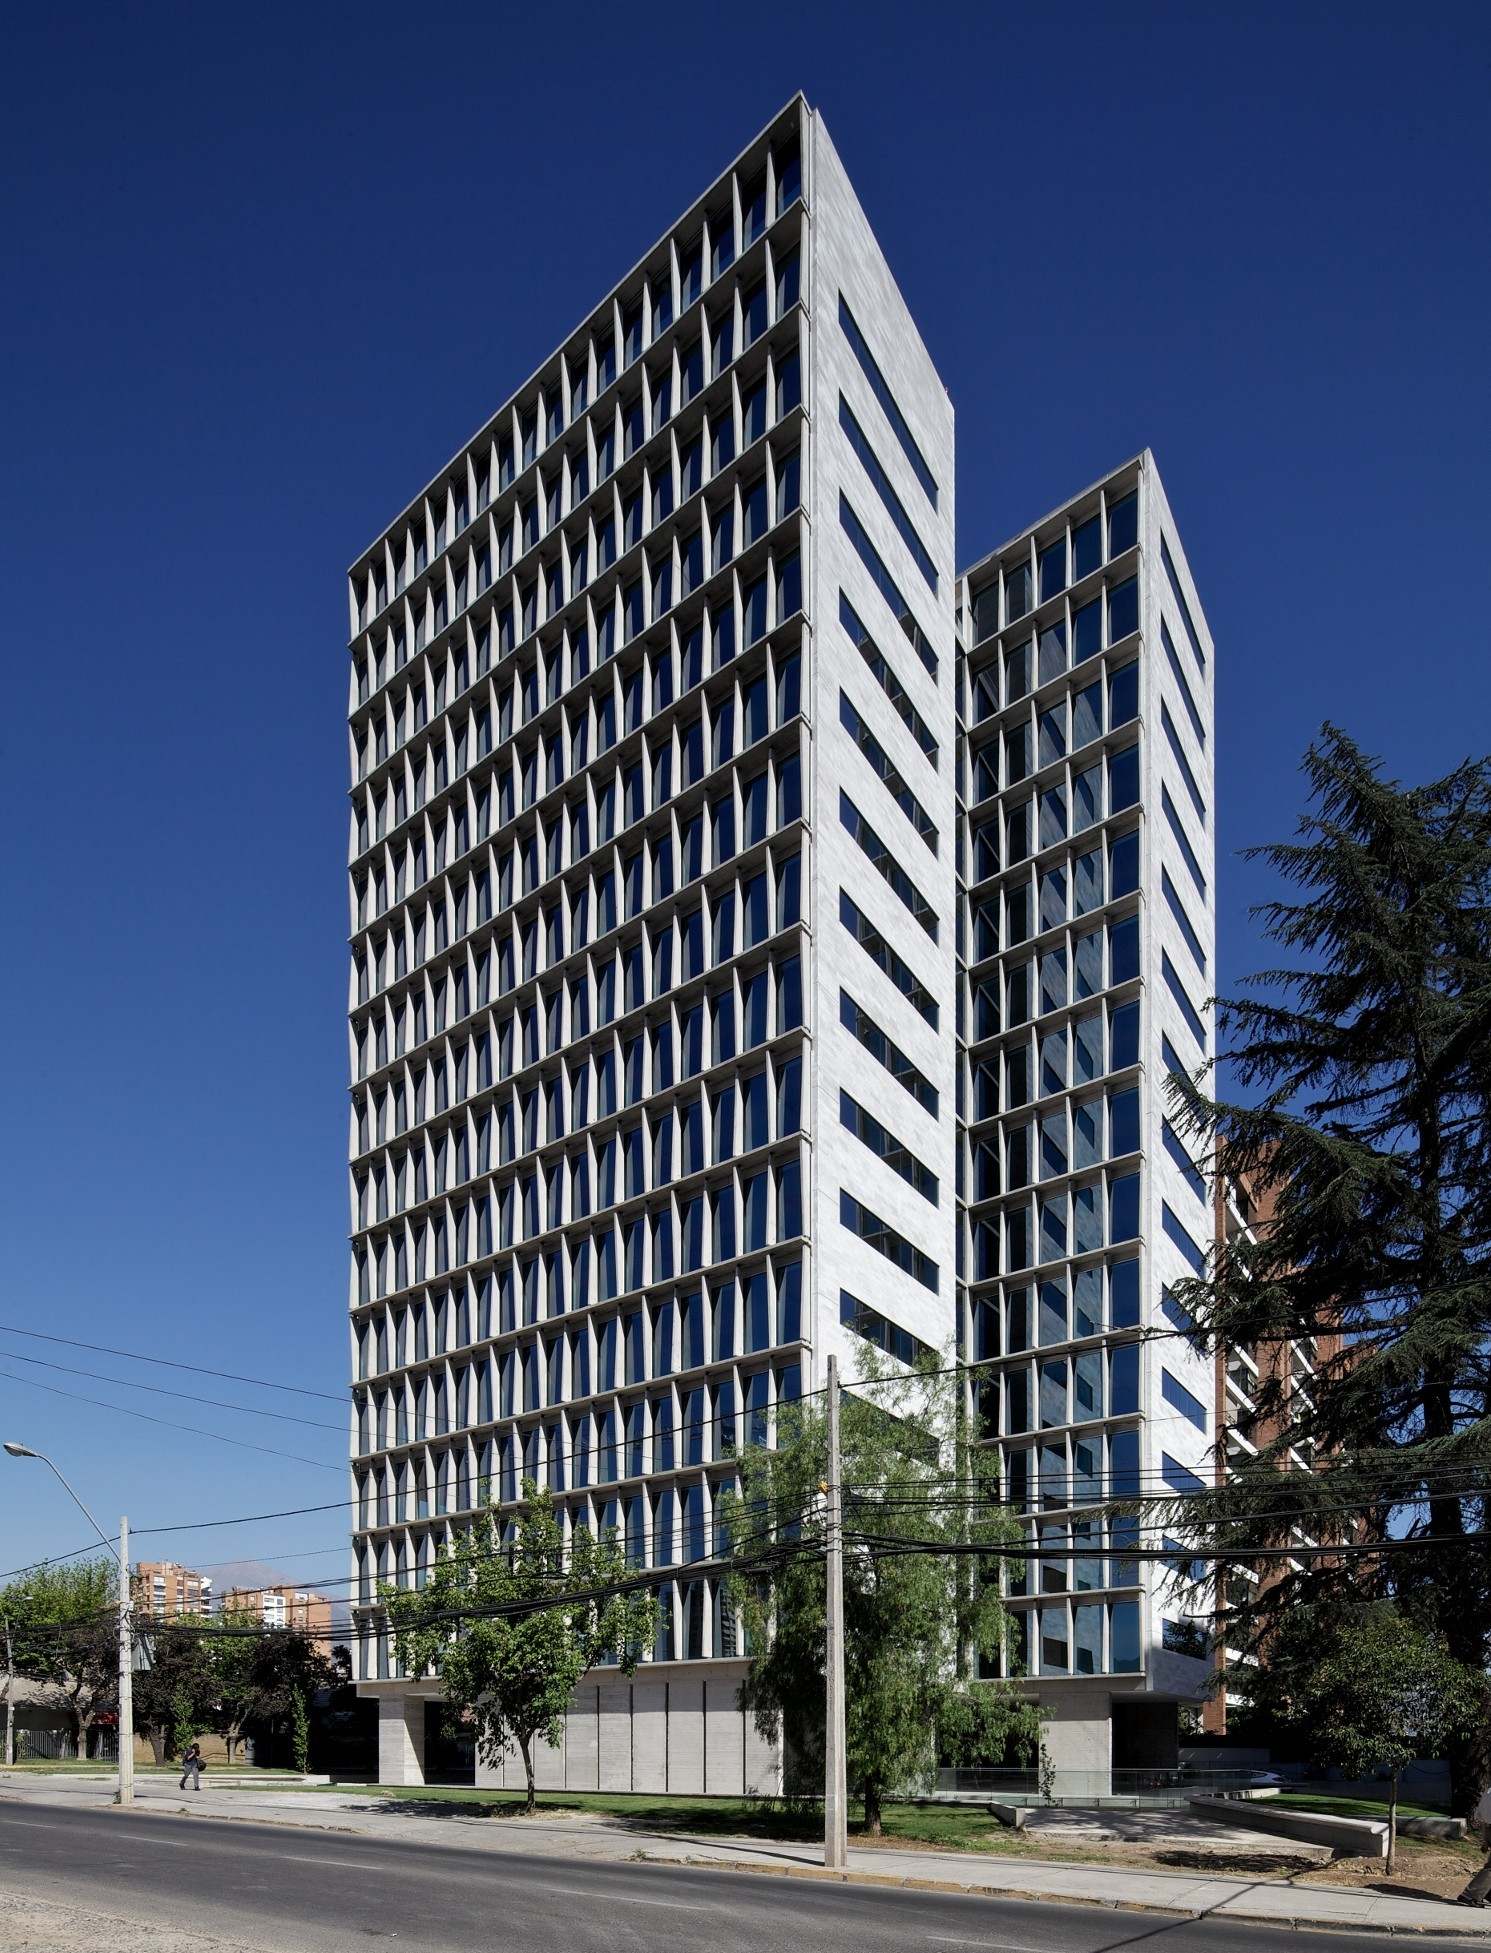 Edificio de oficinas calle los militares mobil for Plataforma arquitectura